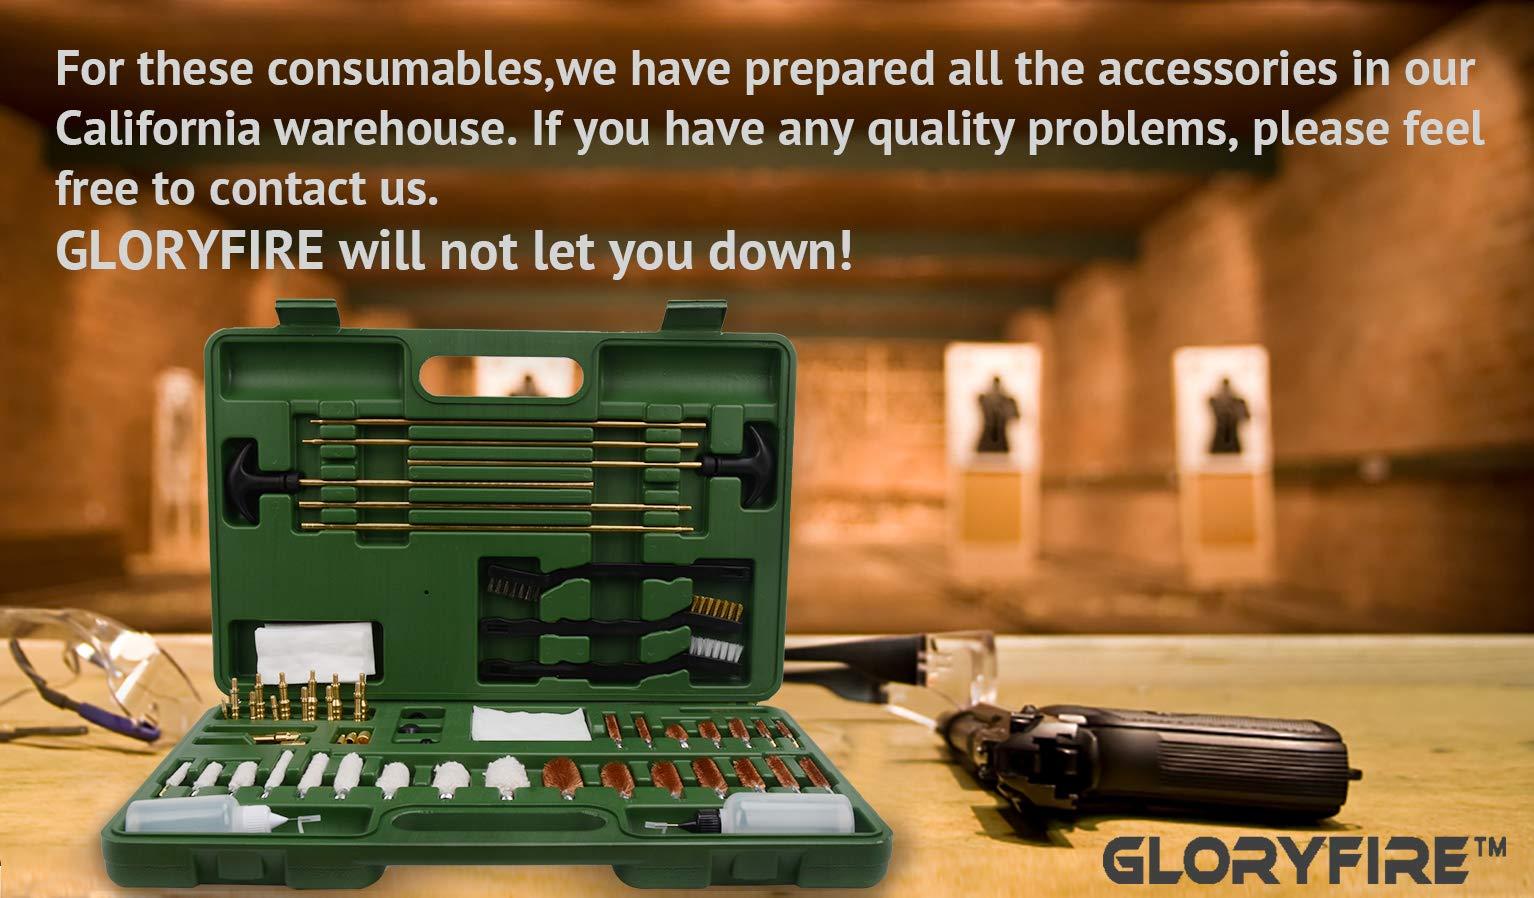 GLORYFIRE Universal Gun Cleaning Kit Hunting Rilfe Handgun Shot Gun Cleaning Kit for All Guns with Case Travel Size Portable Metal Brushes (Green 2) by GLORYFIRE (Image #7)